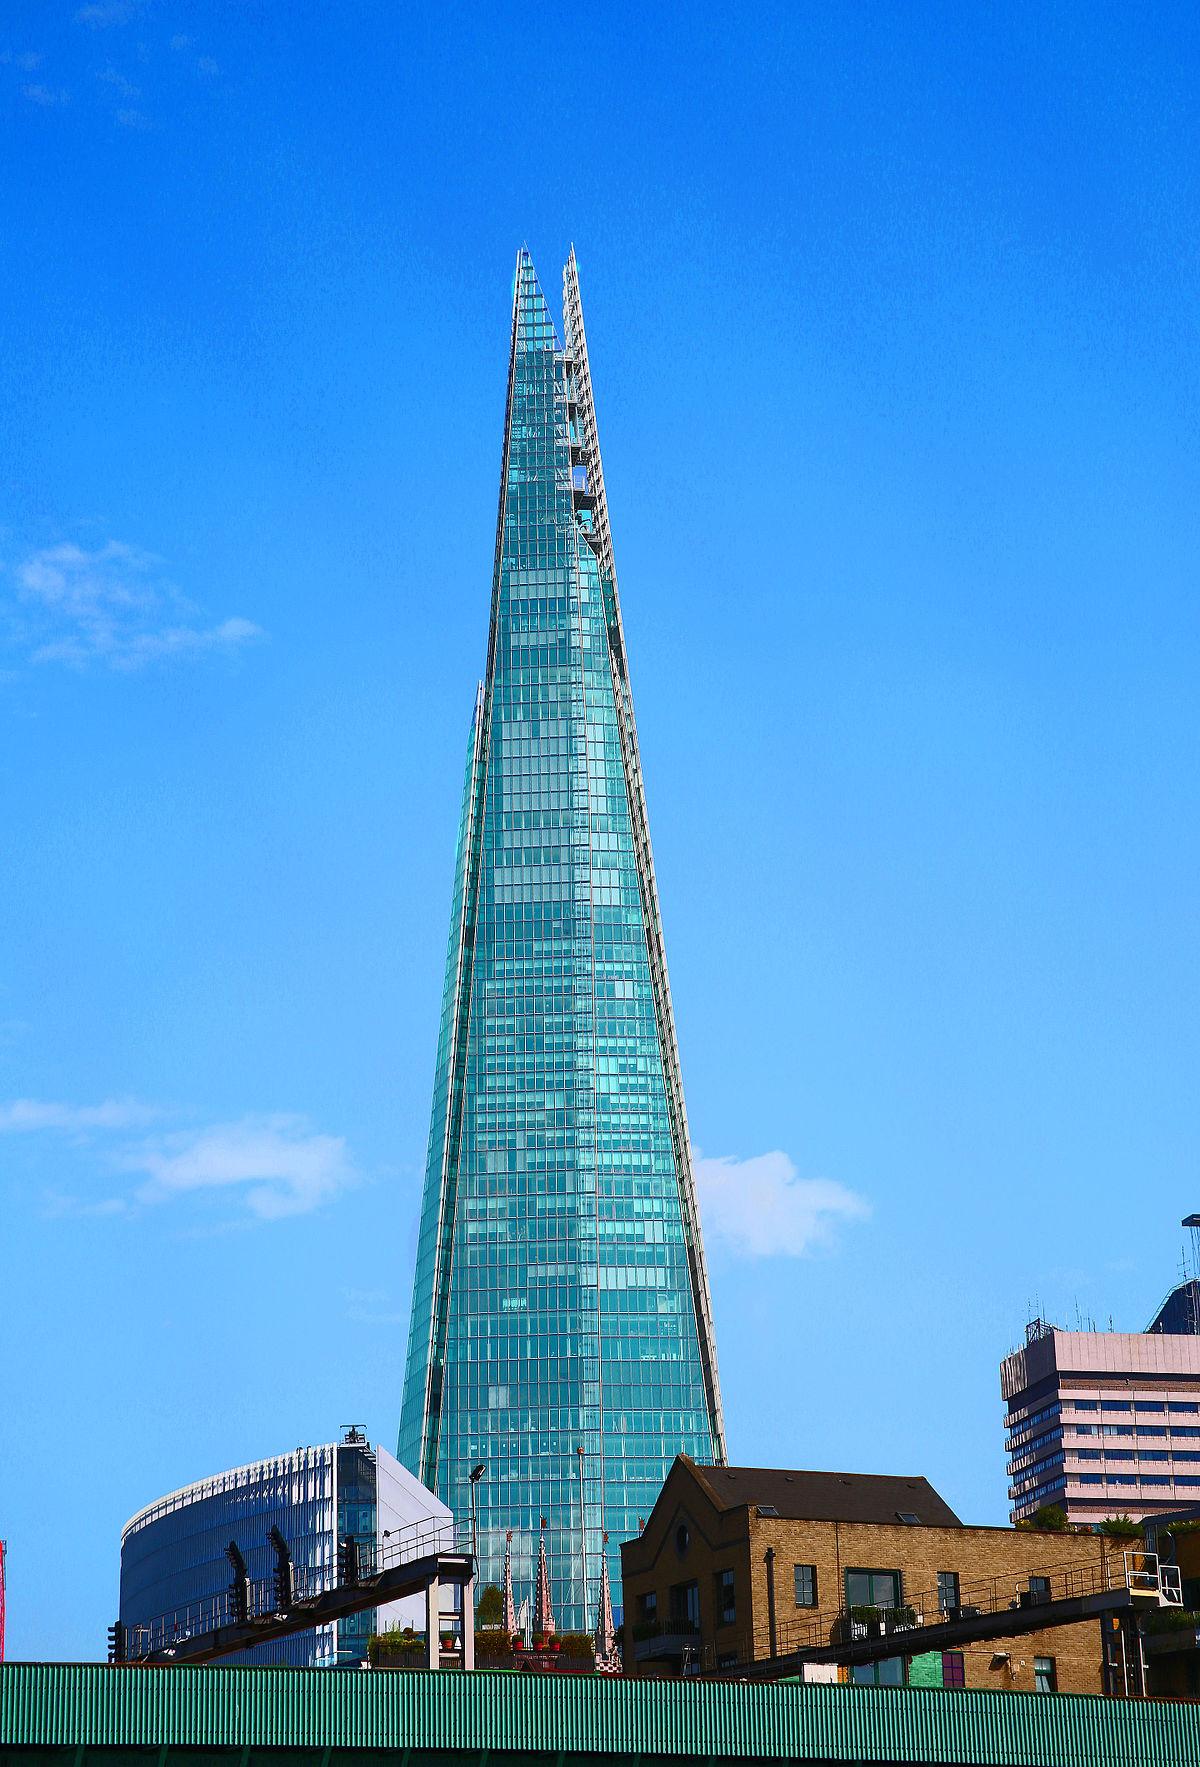 File:Modern Architecture (15116282779).jpg - Wikimedia Commons